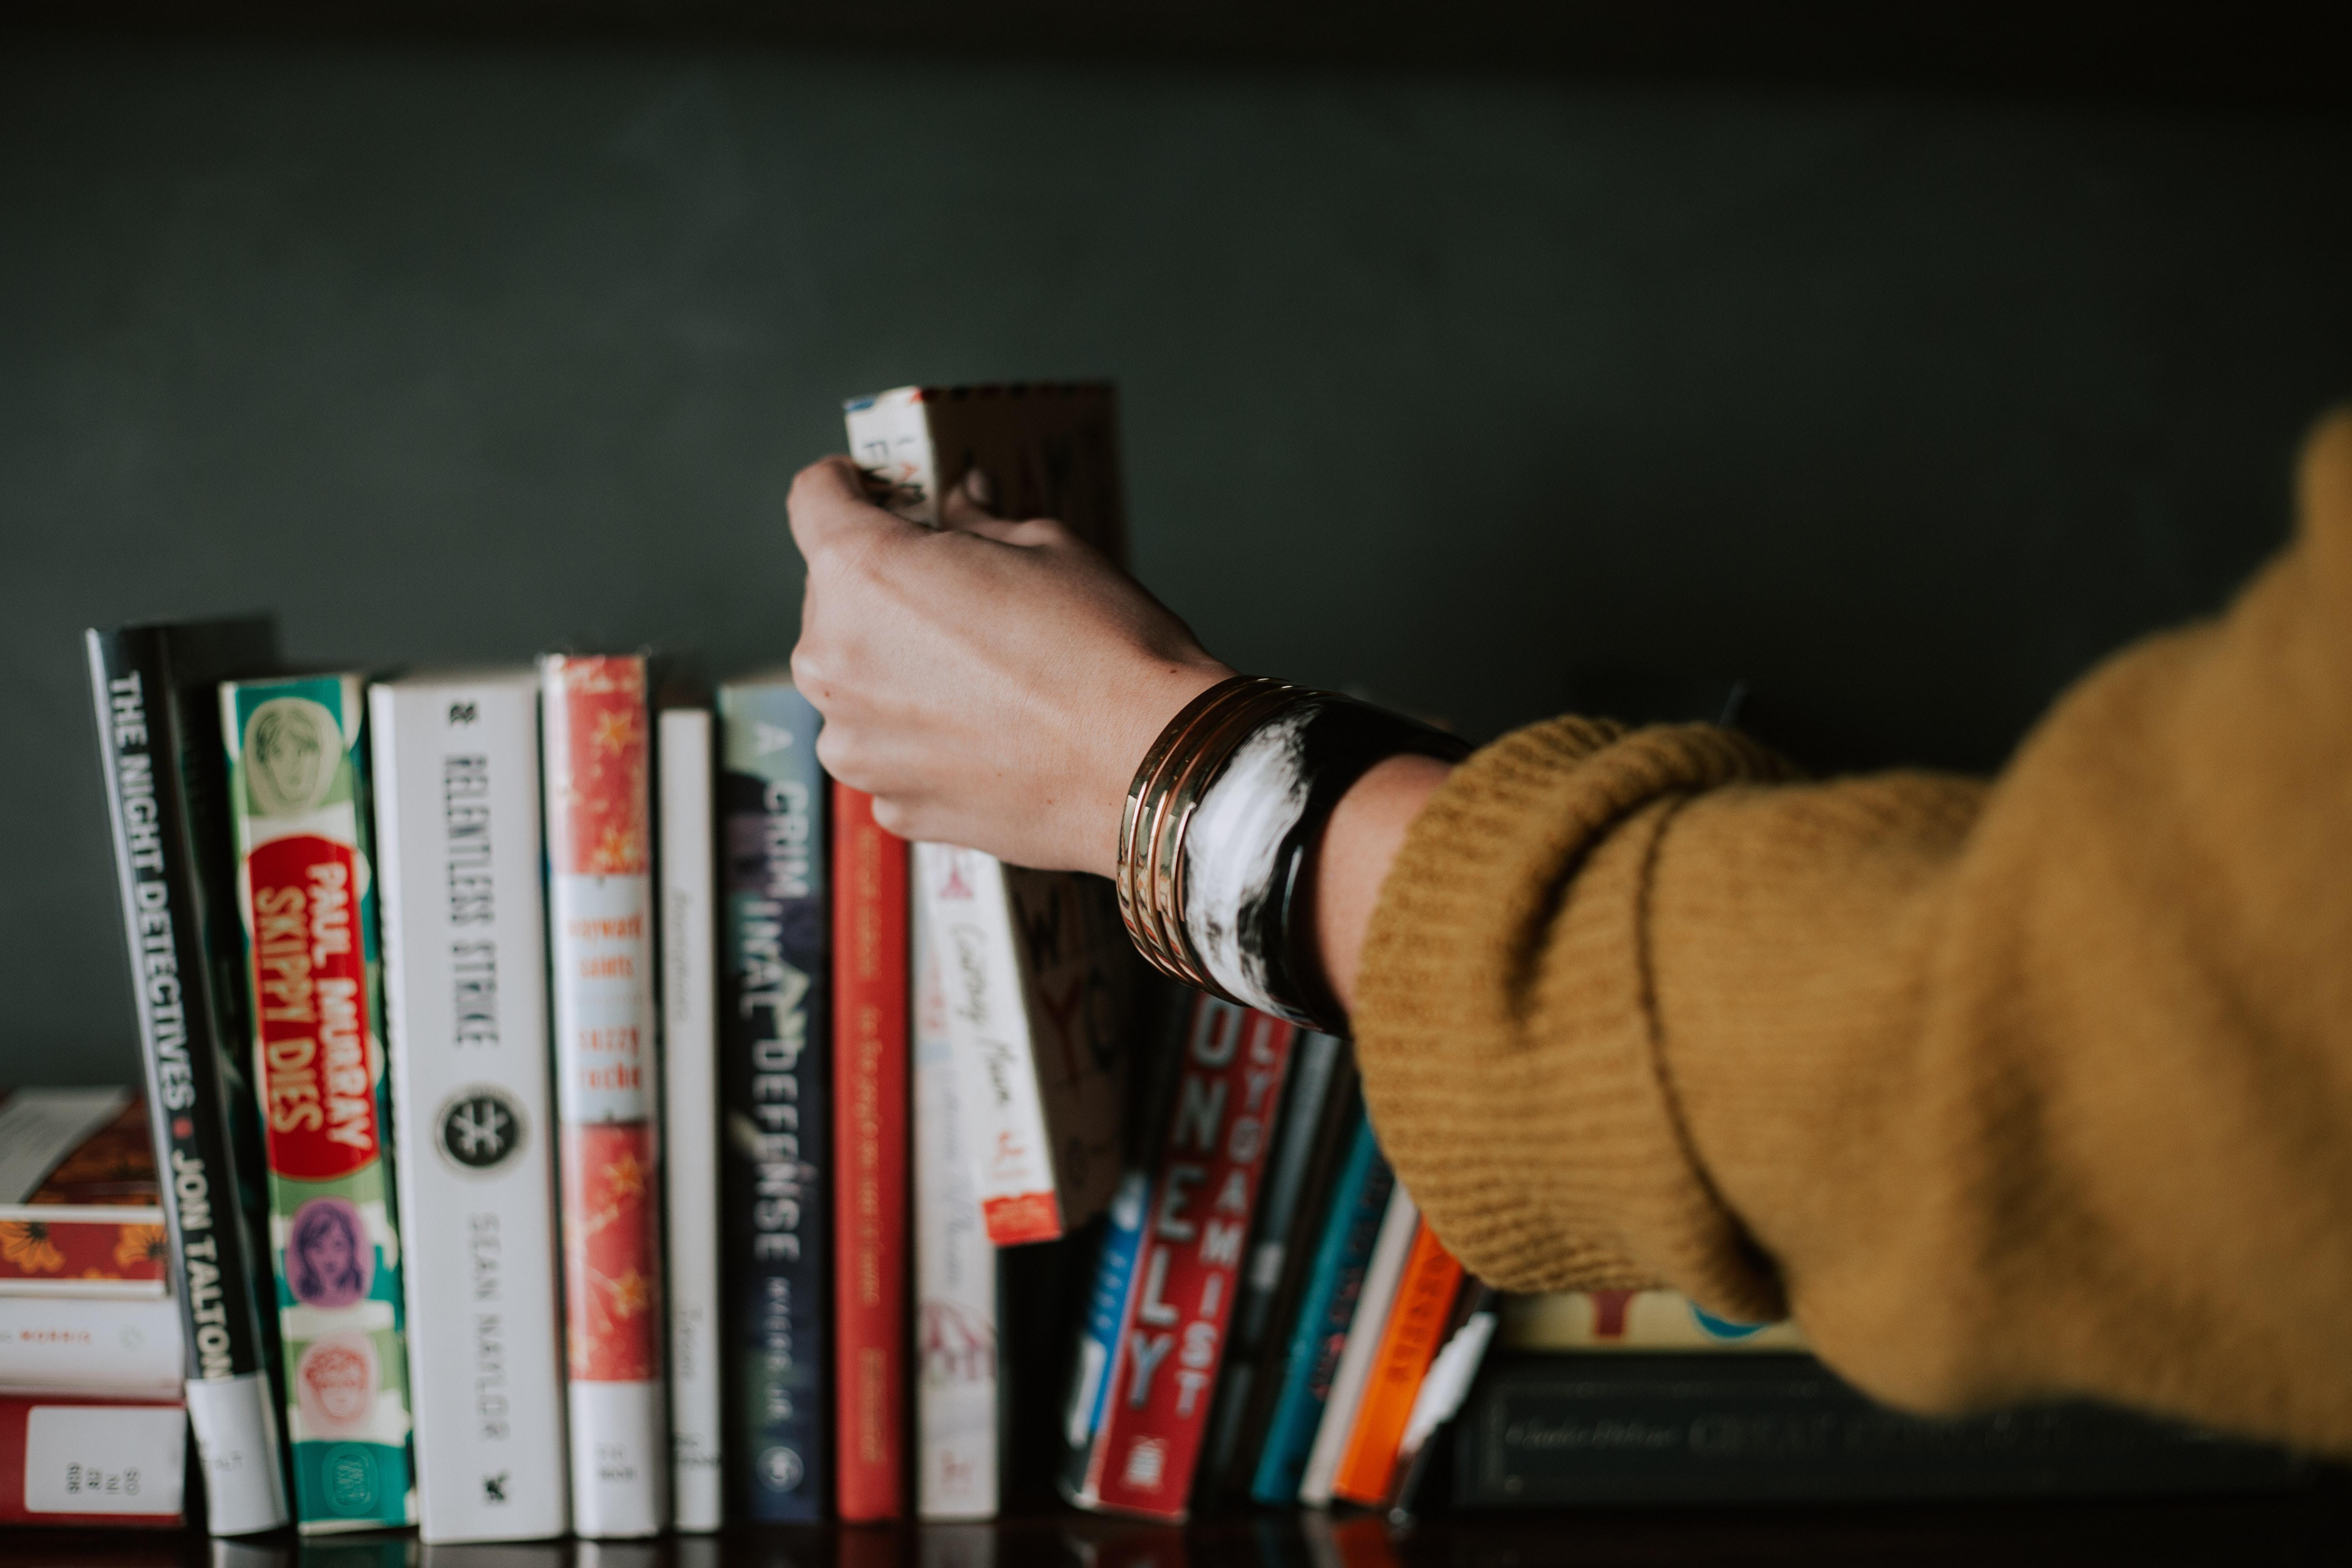 Arm taking a book off a shelf